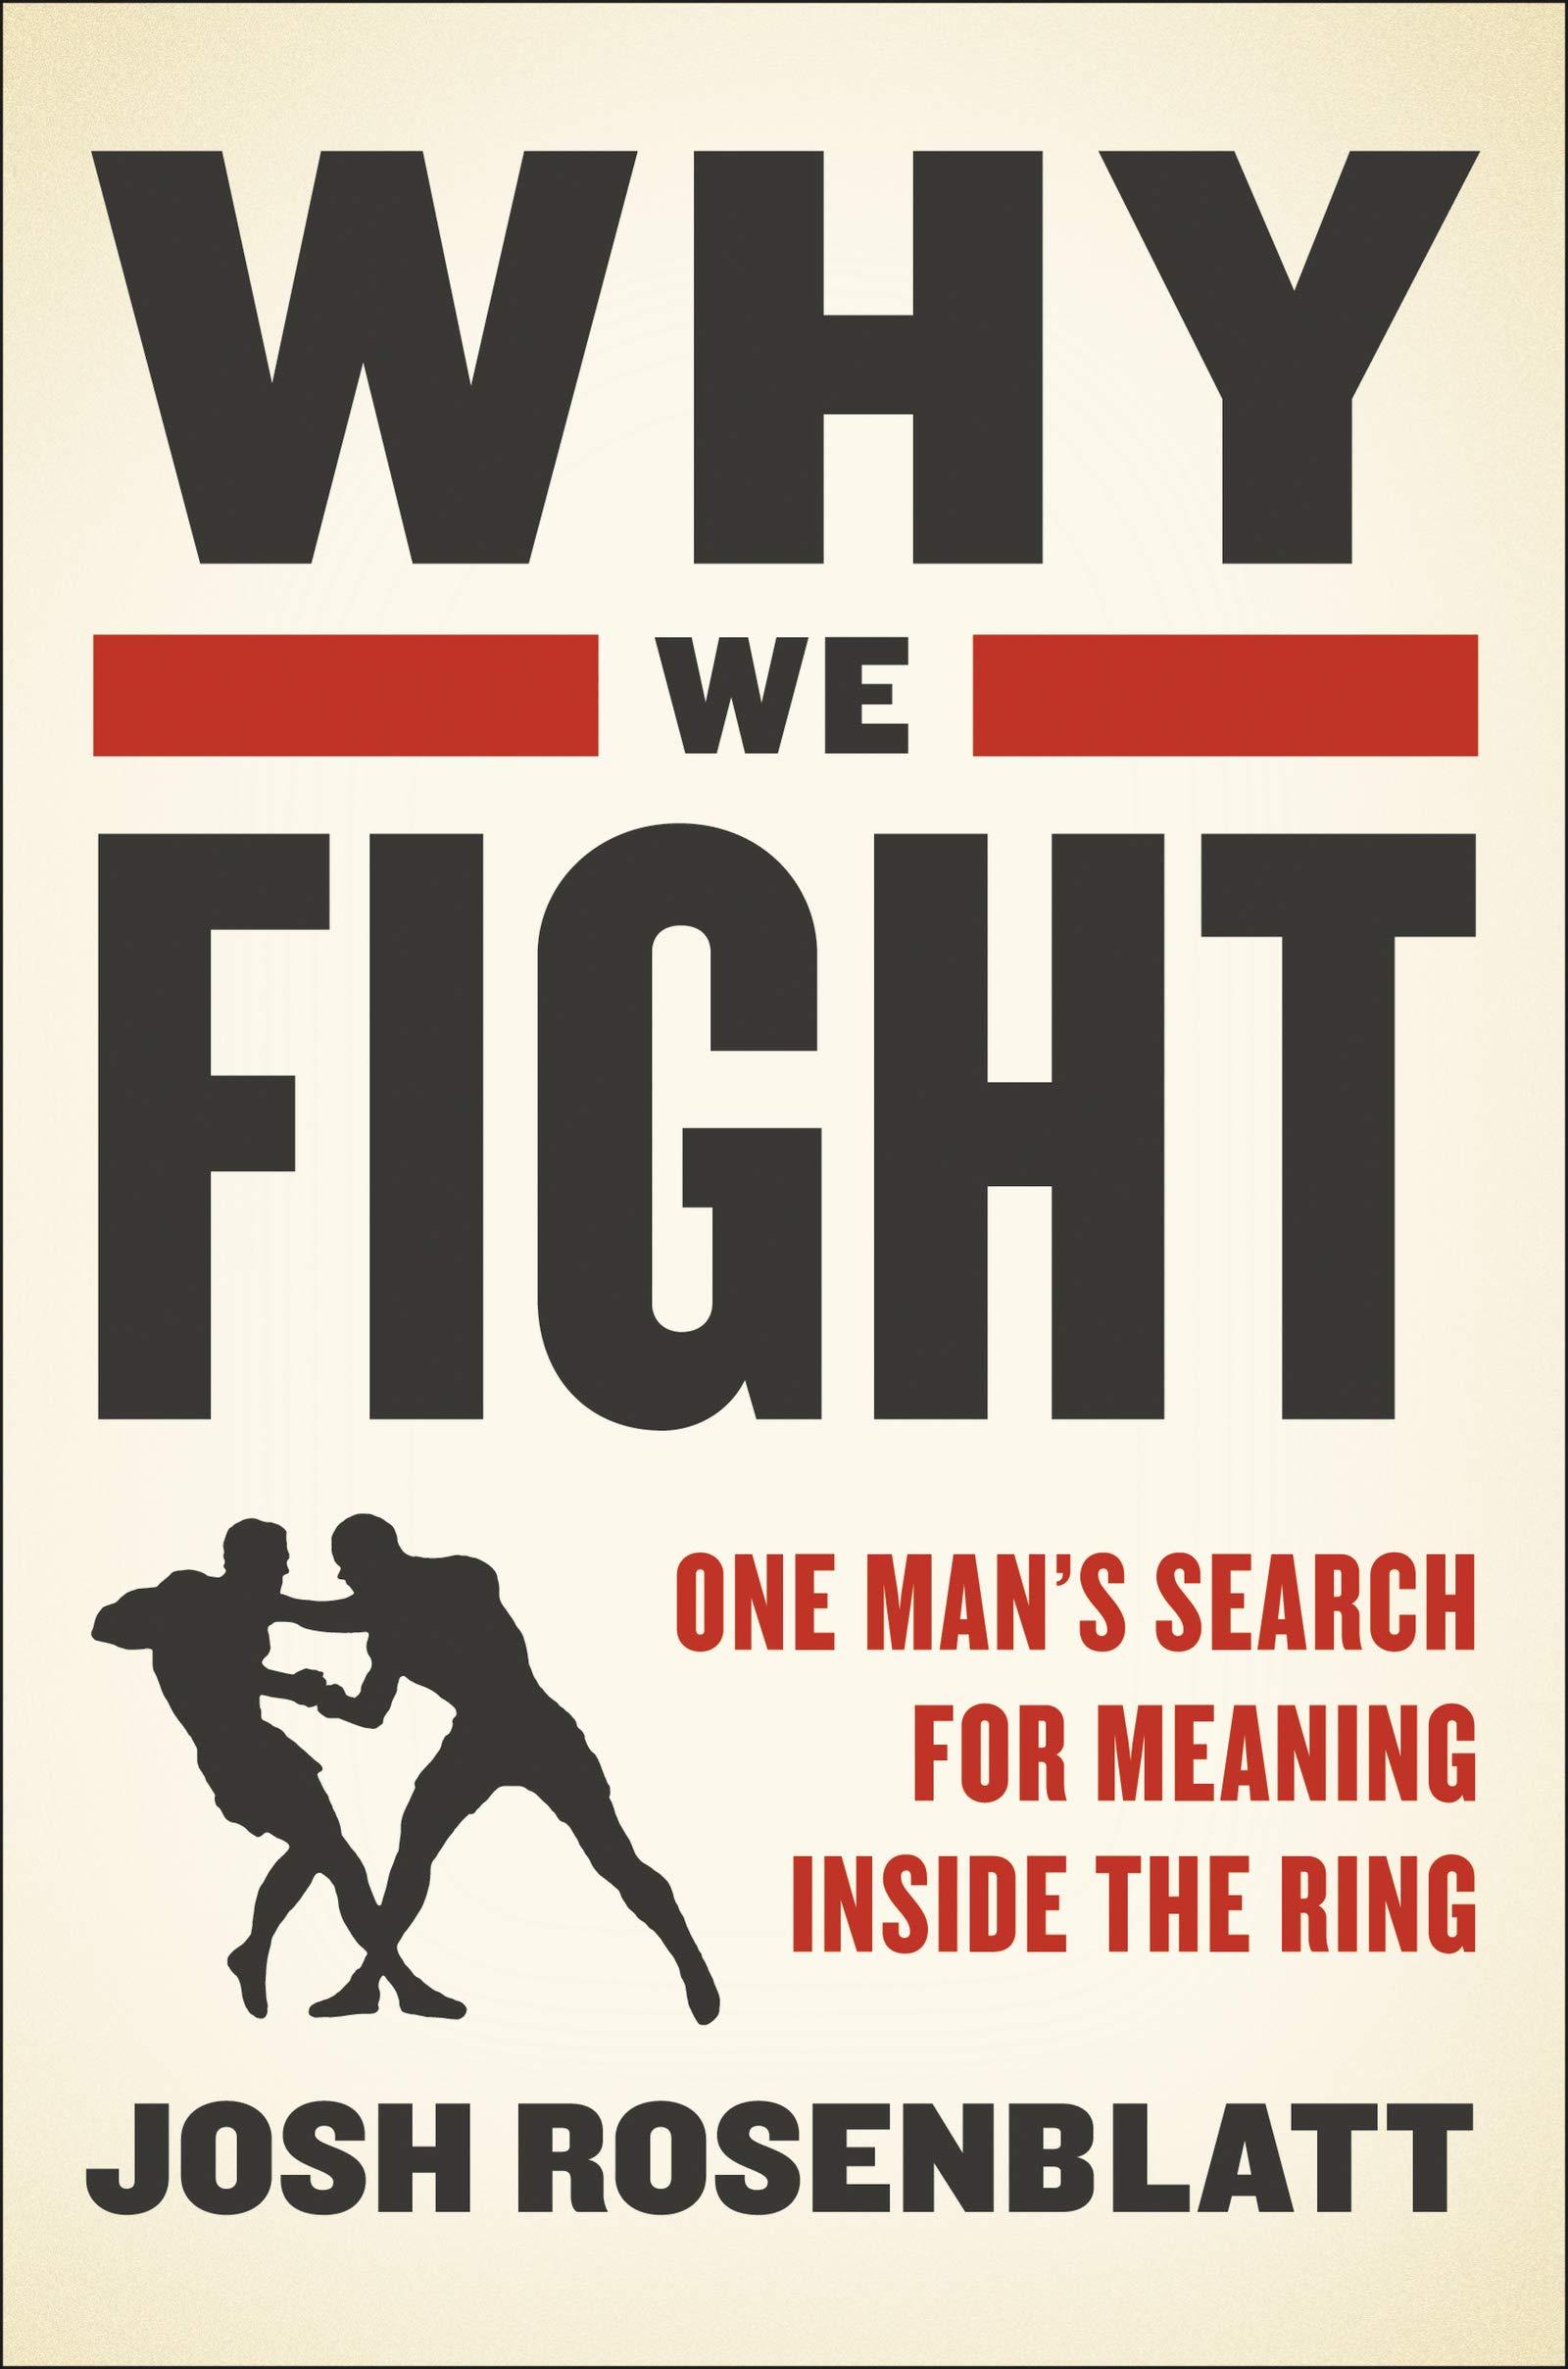 Why we Fight by Josh Rosenblatt book cover.